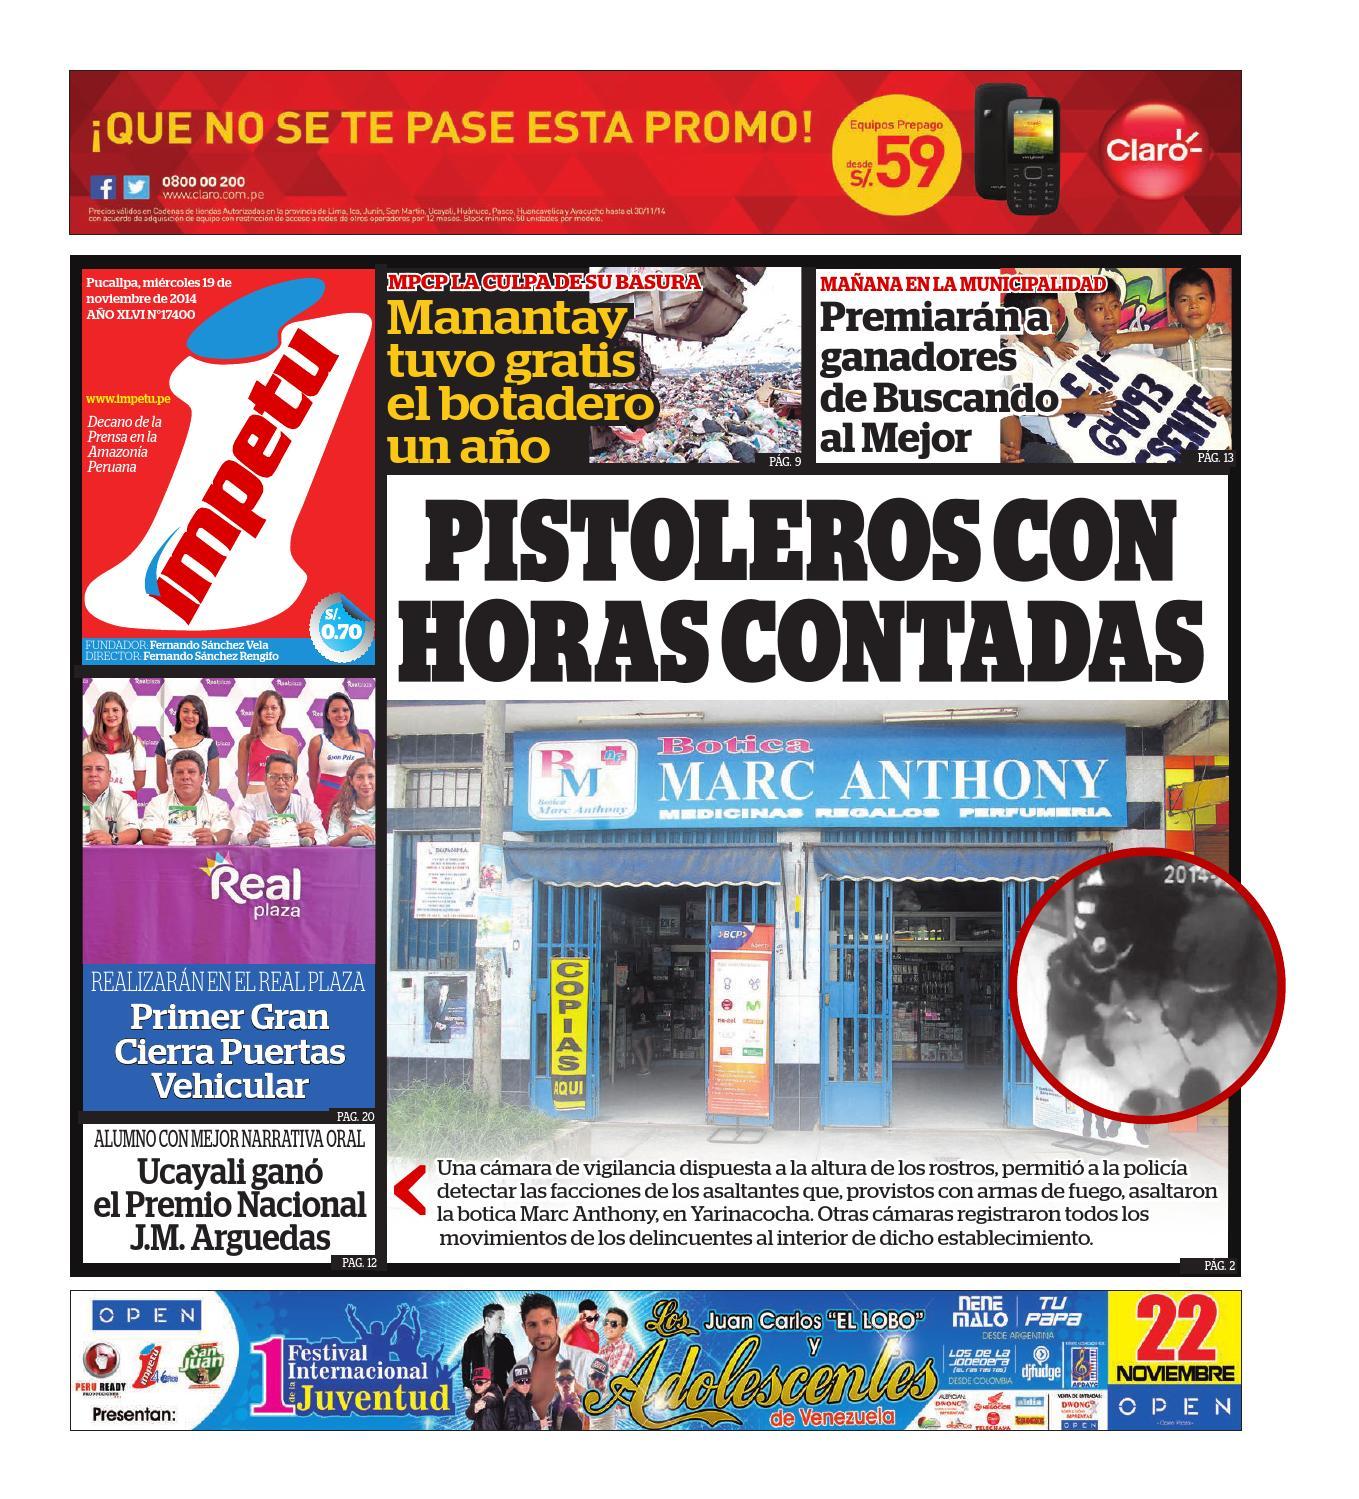 c09c2921 Impetu 19 de noviembre de 2014 by Diario Ímpetu - issuu